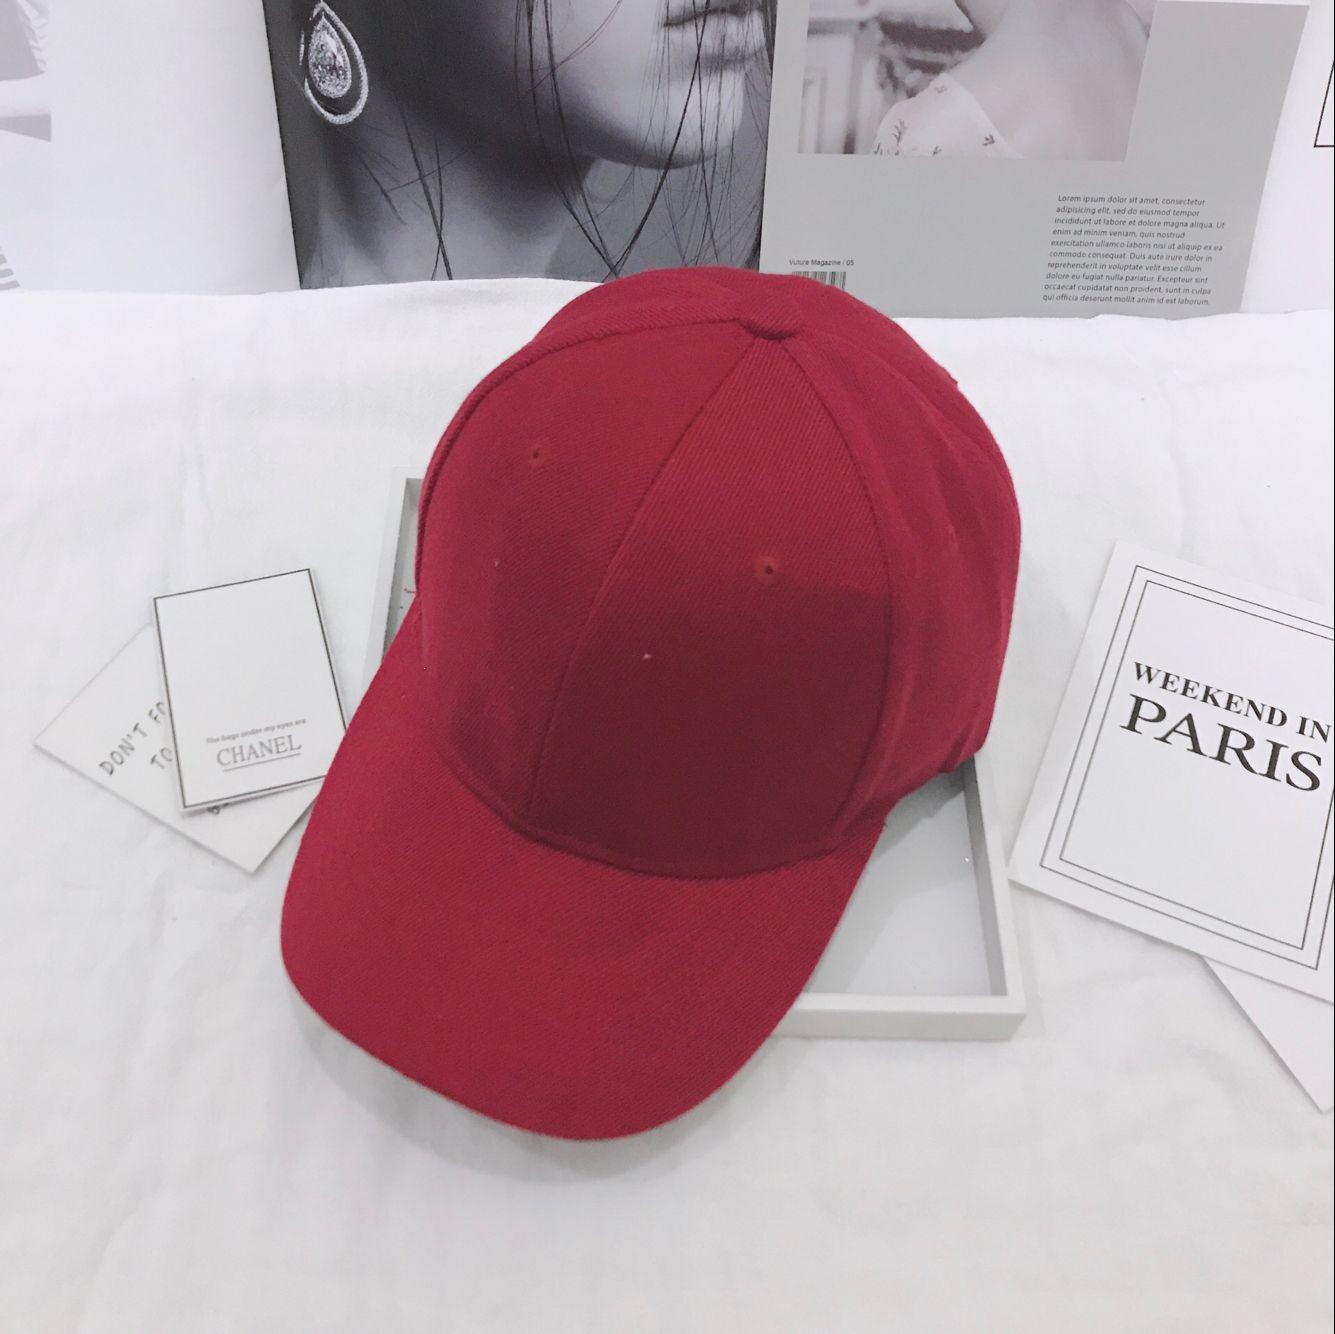 3abdb24c6c6 Womens Hat Accessories for sale - Hat Accessories for Women online ...